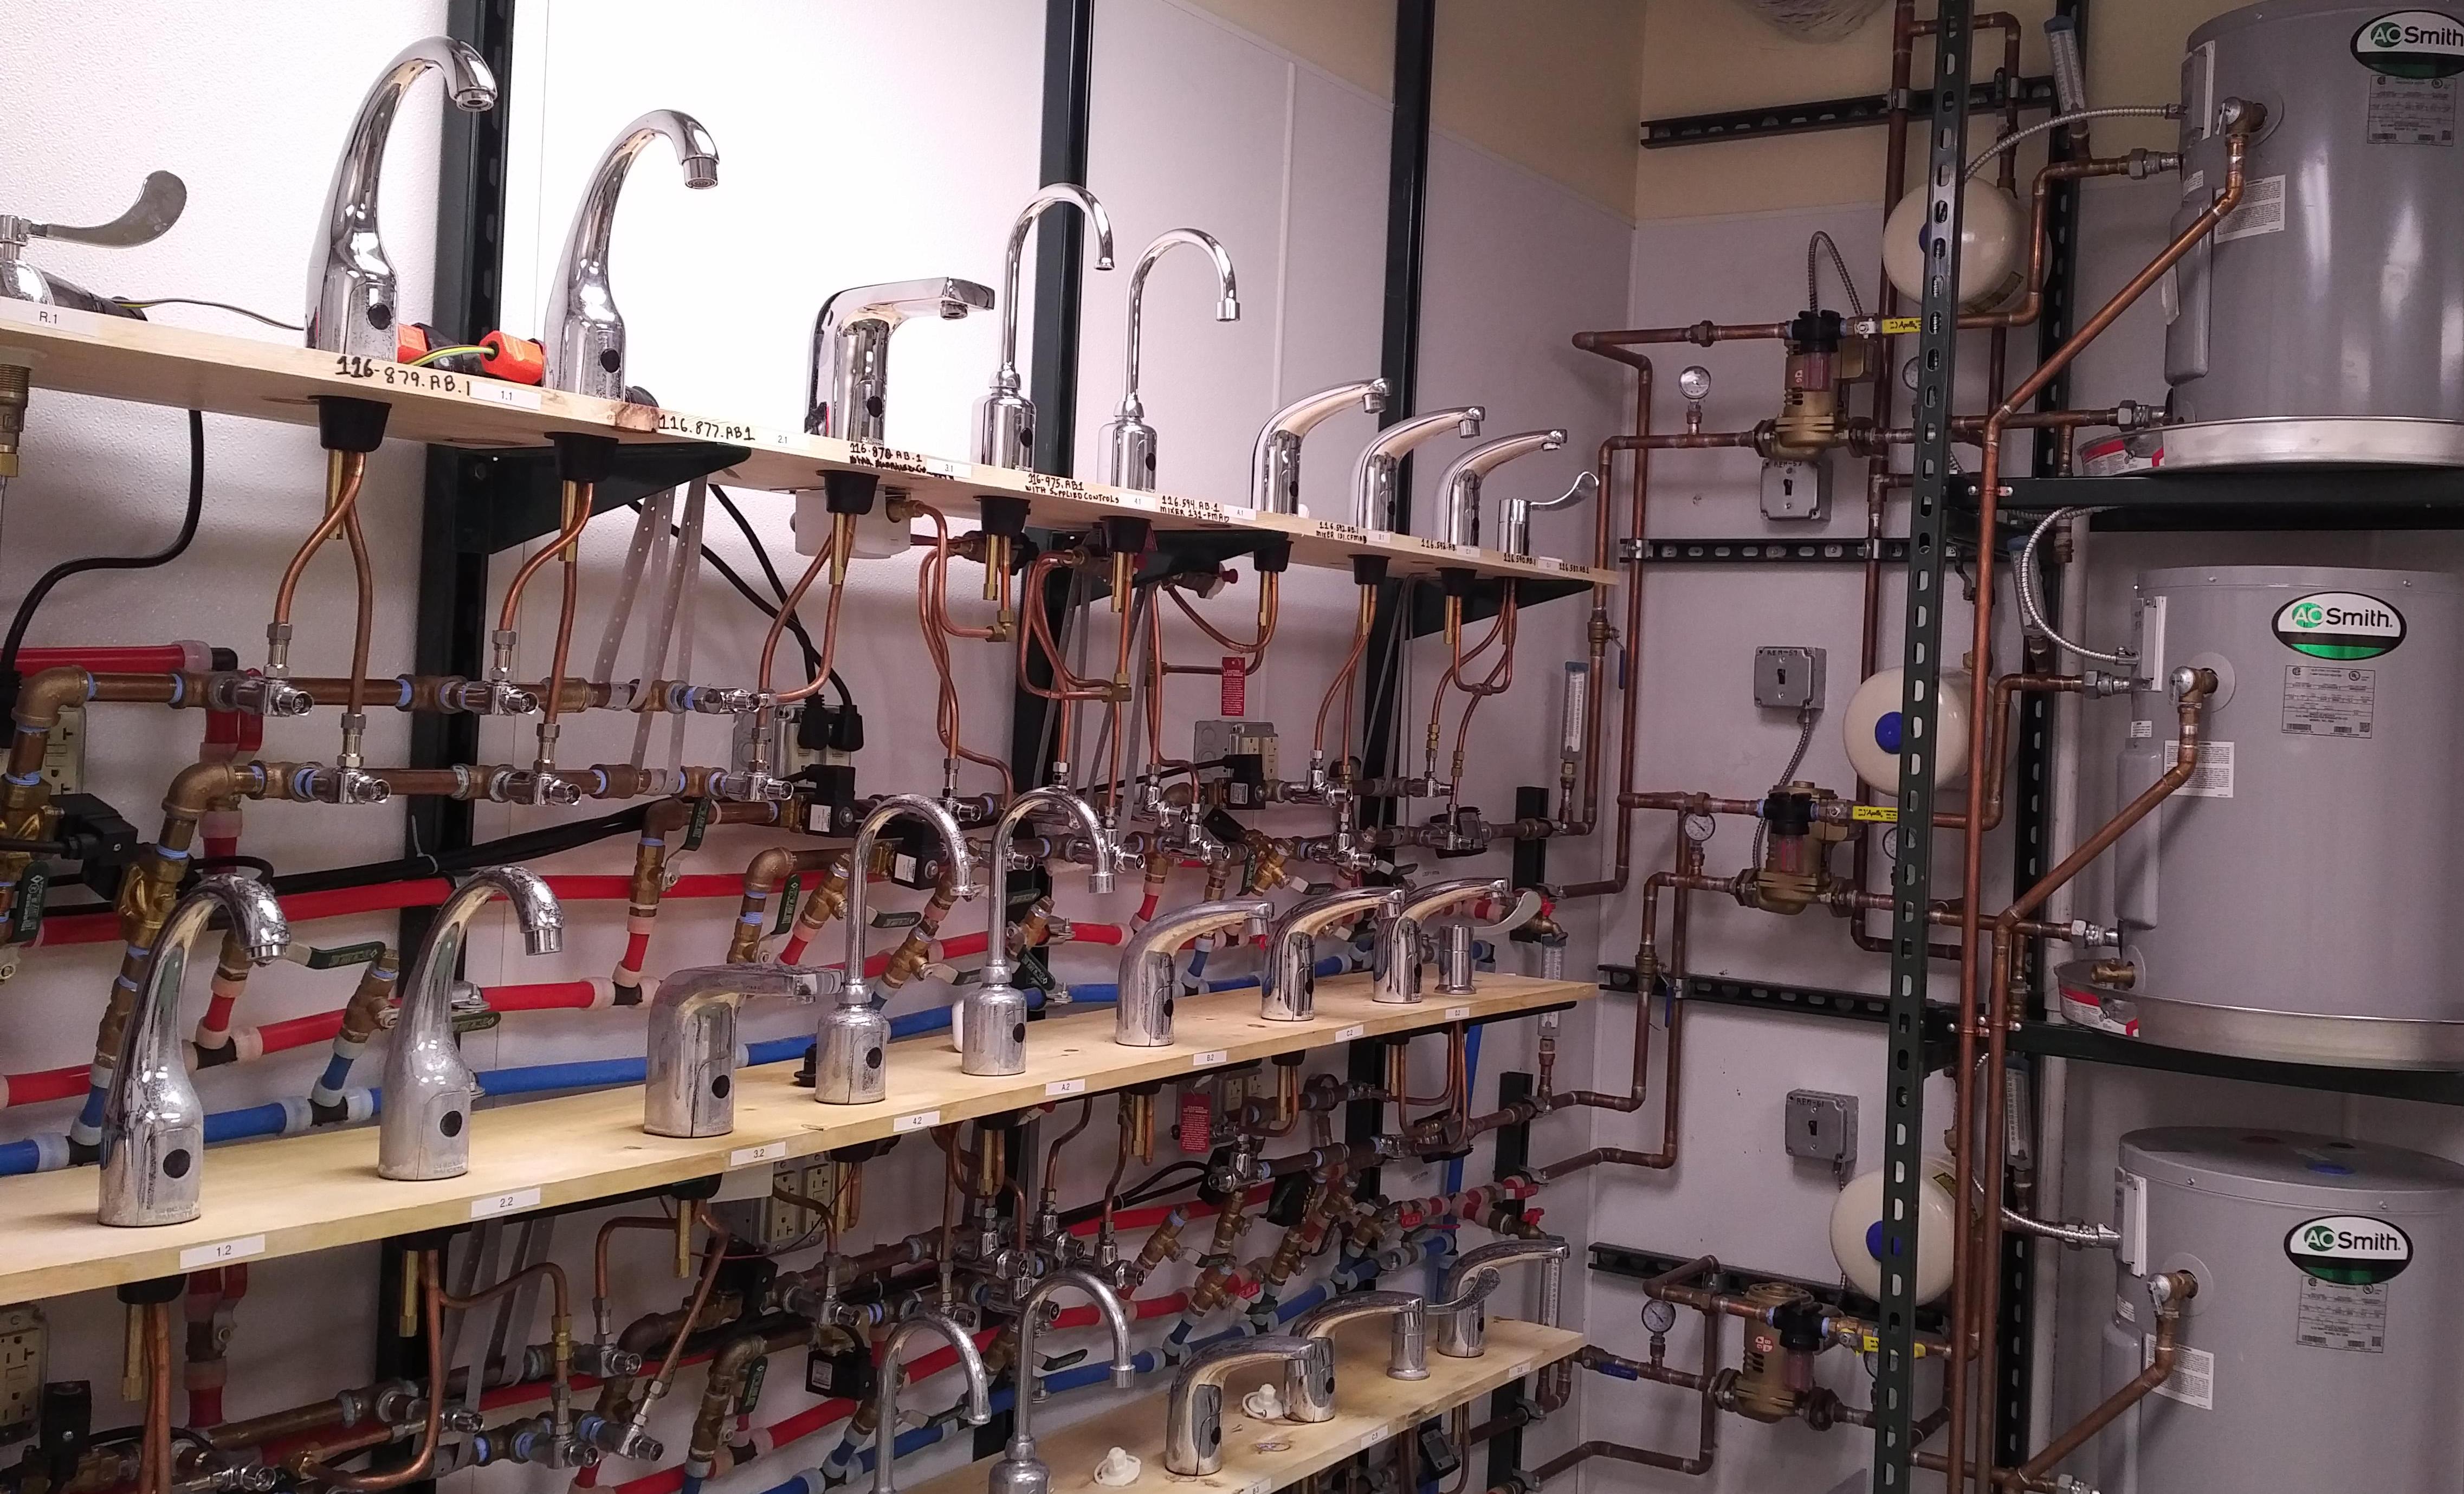 Model Plumbing System